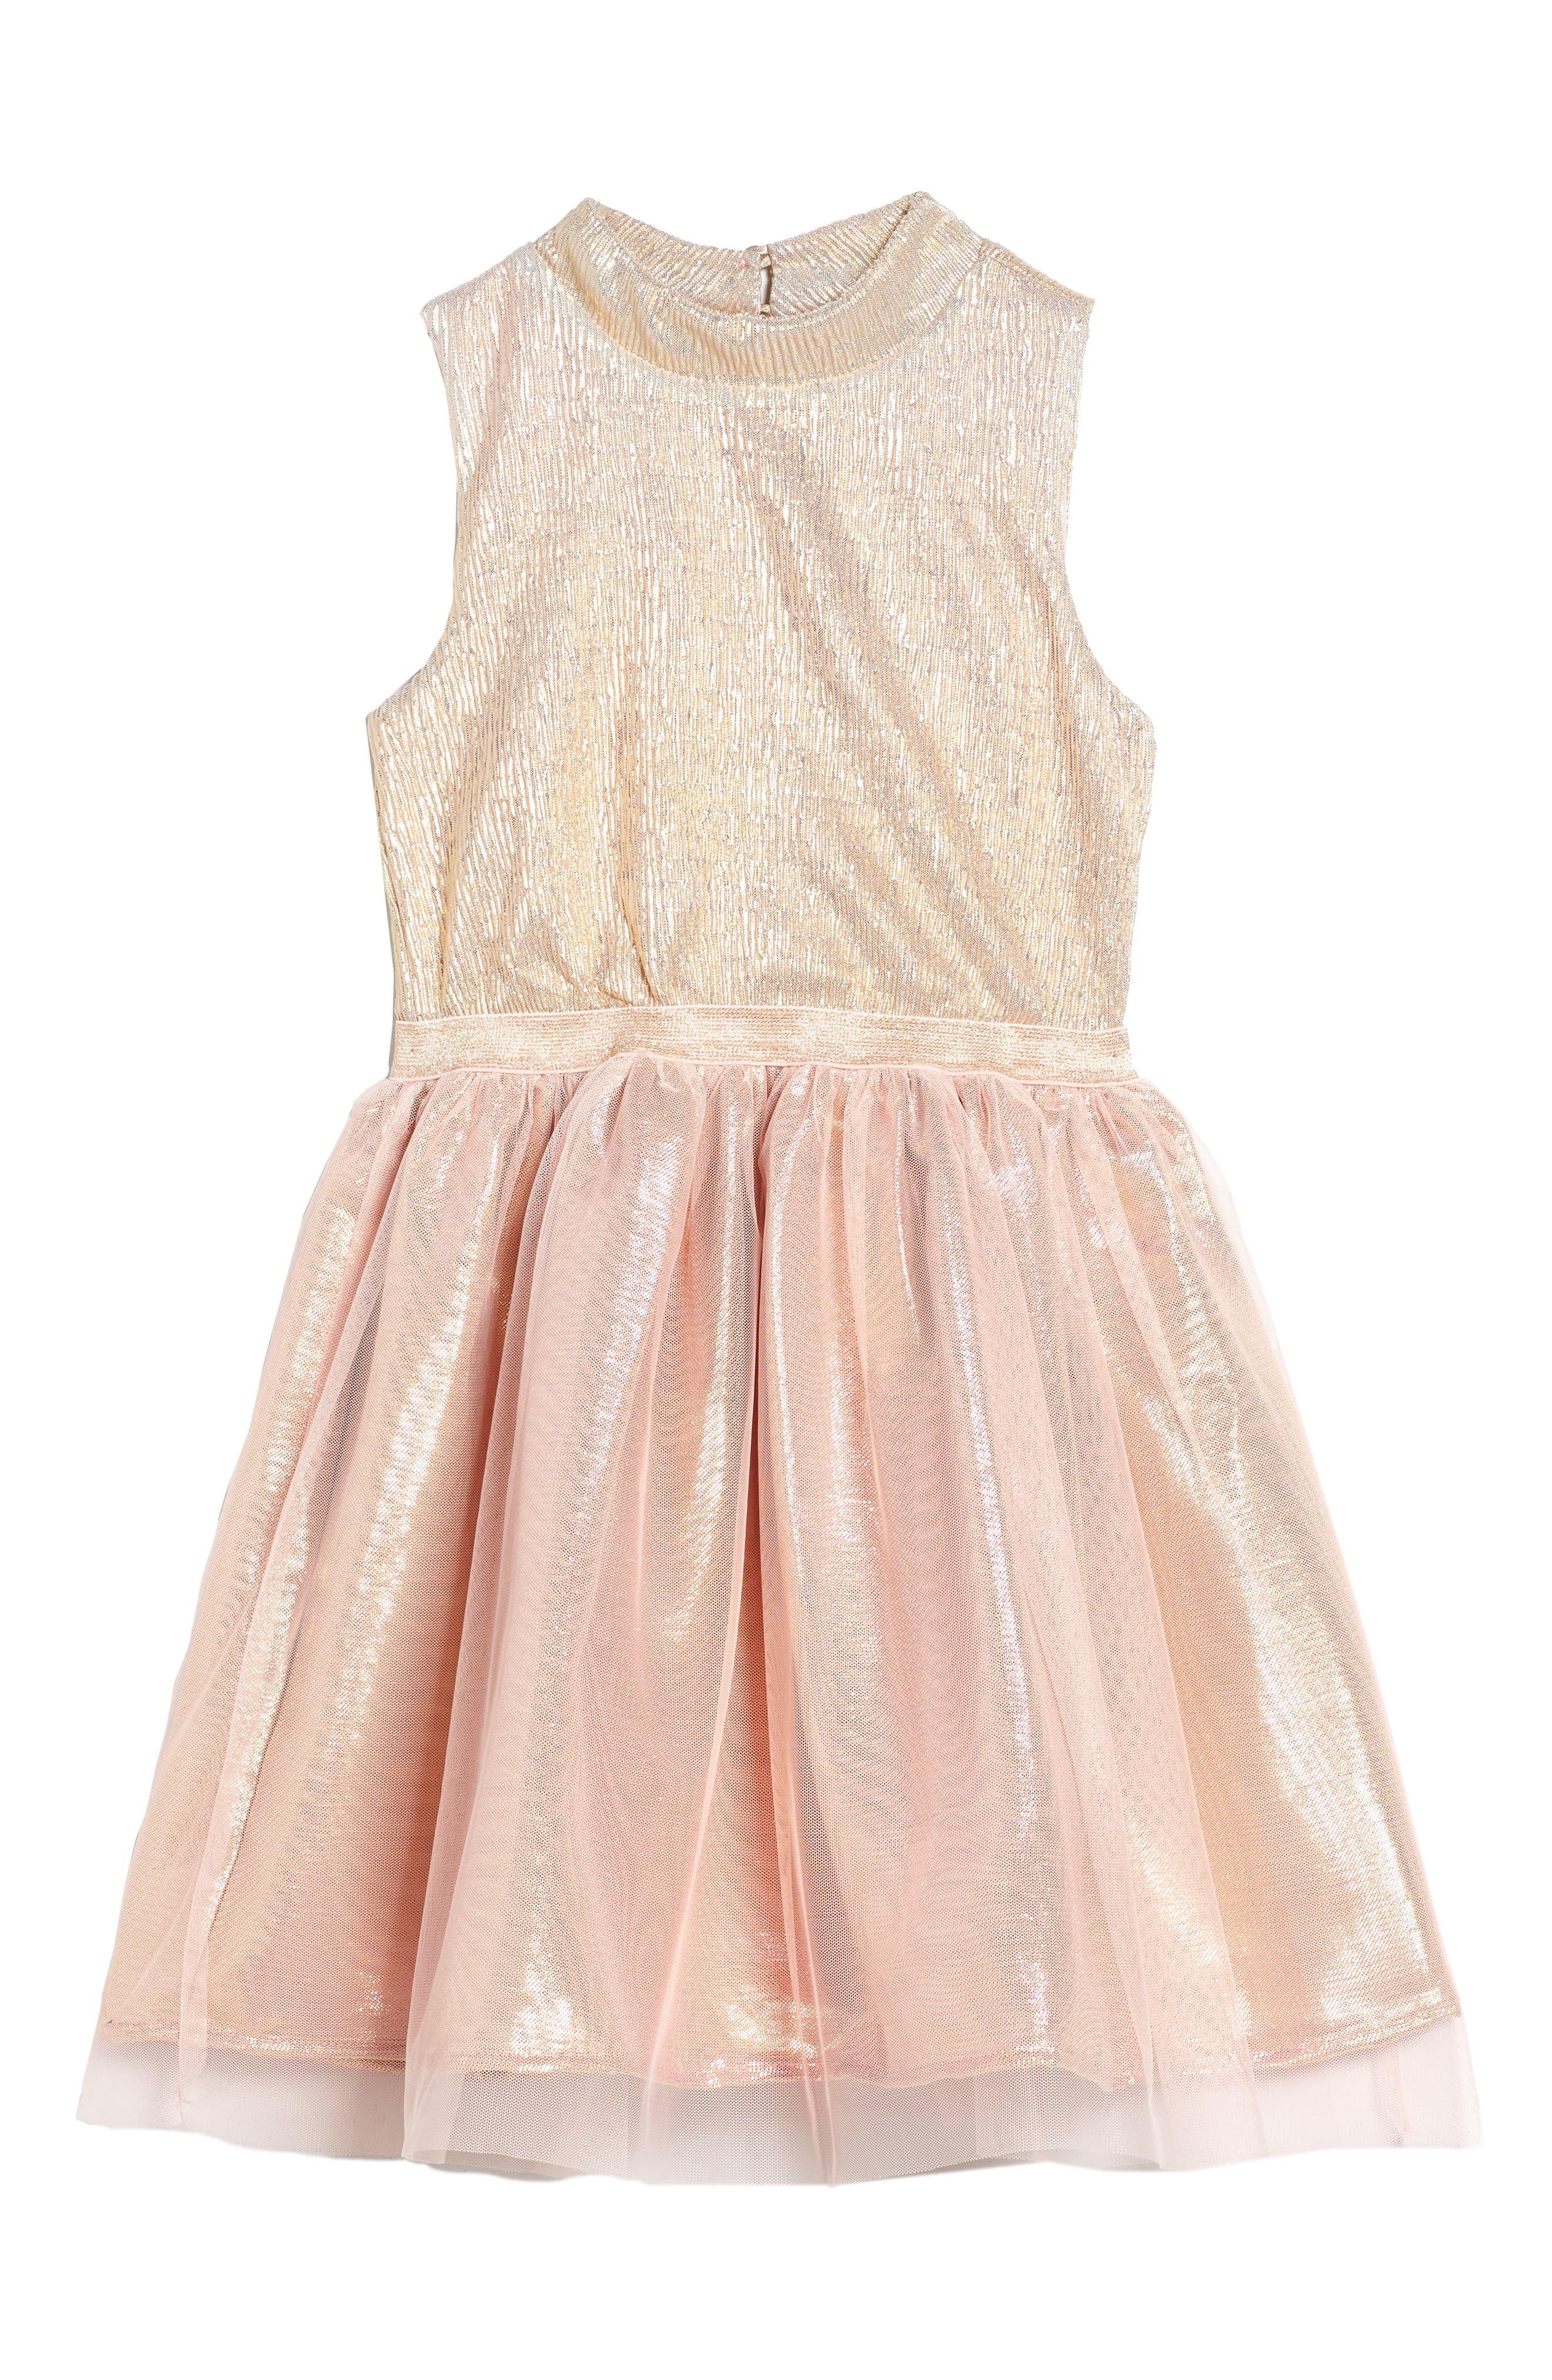 Main Image - Zunie Metallic Shimmer Mock Neck Dress (Big Girls)